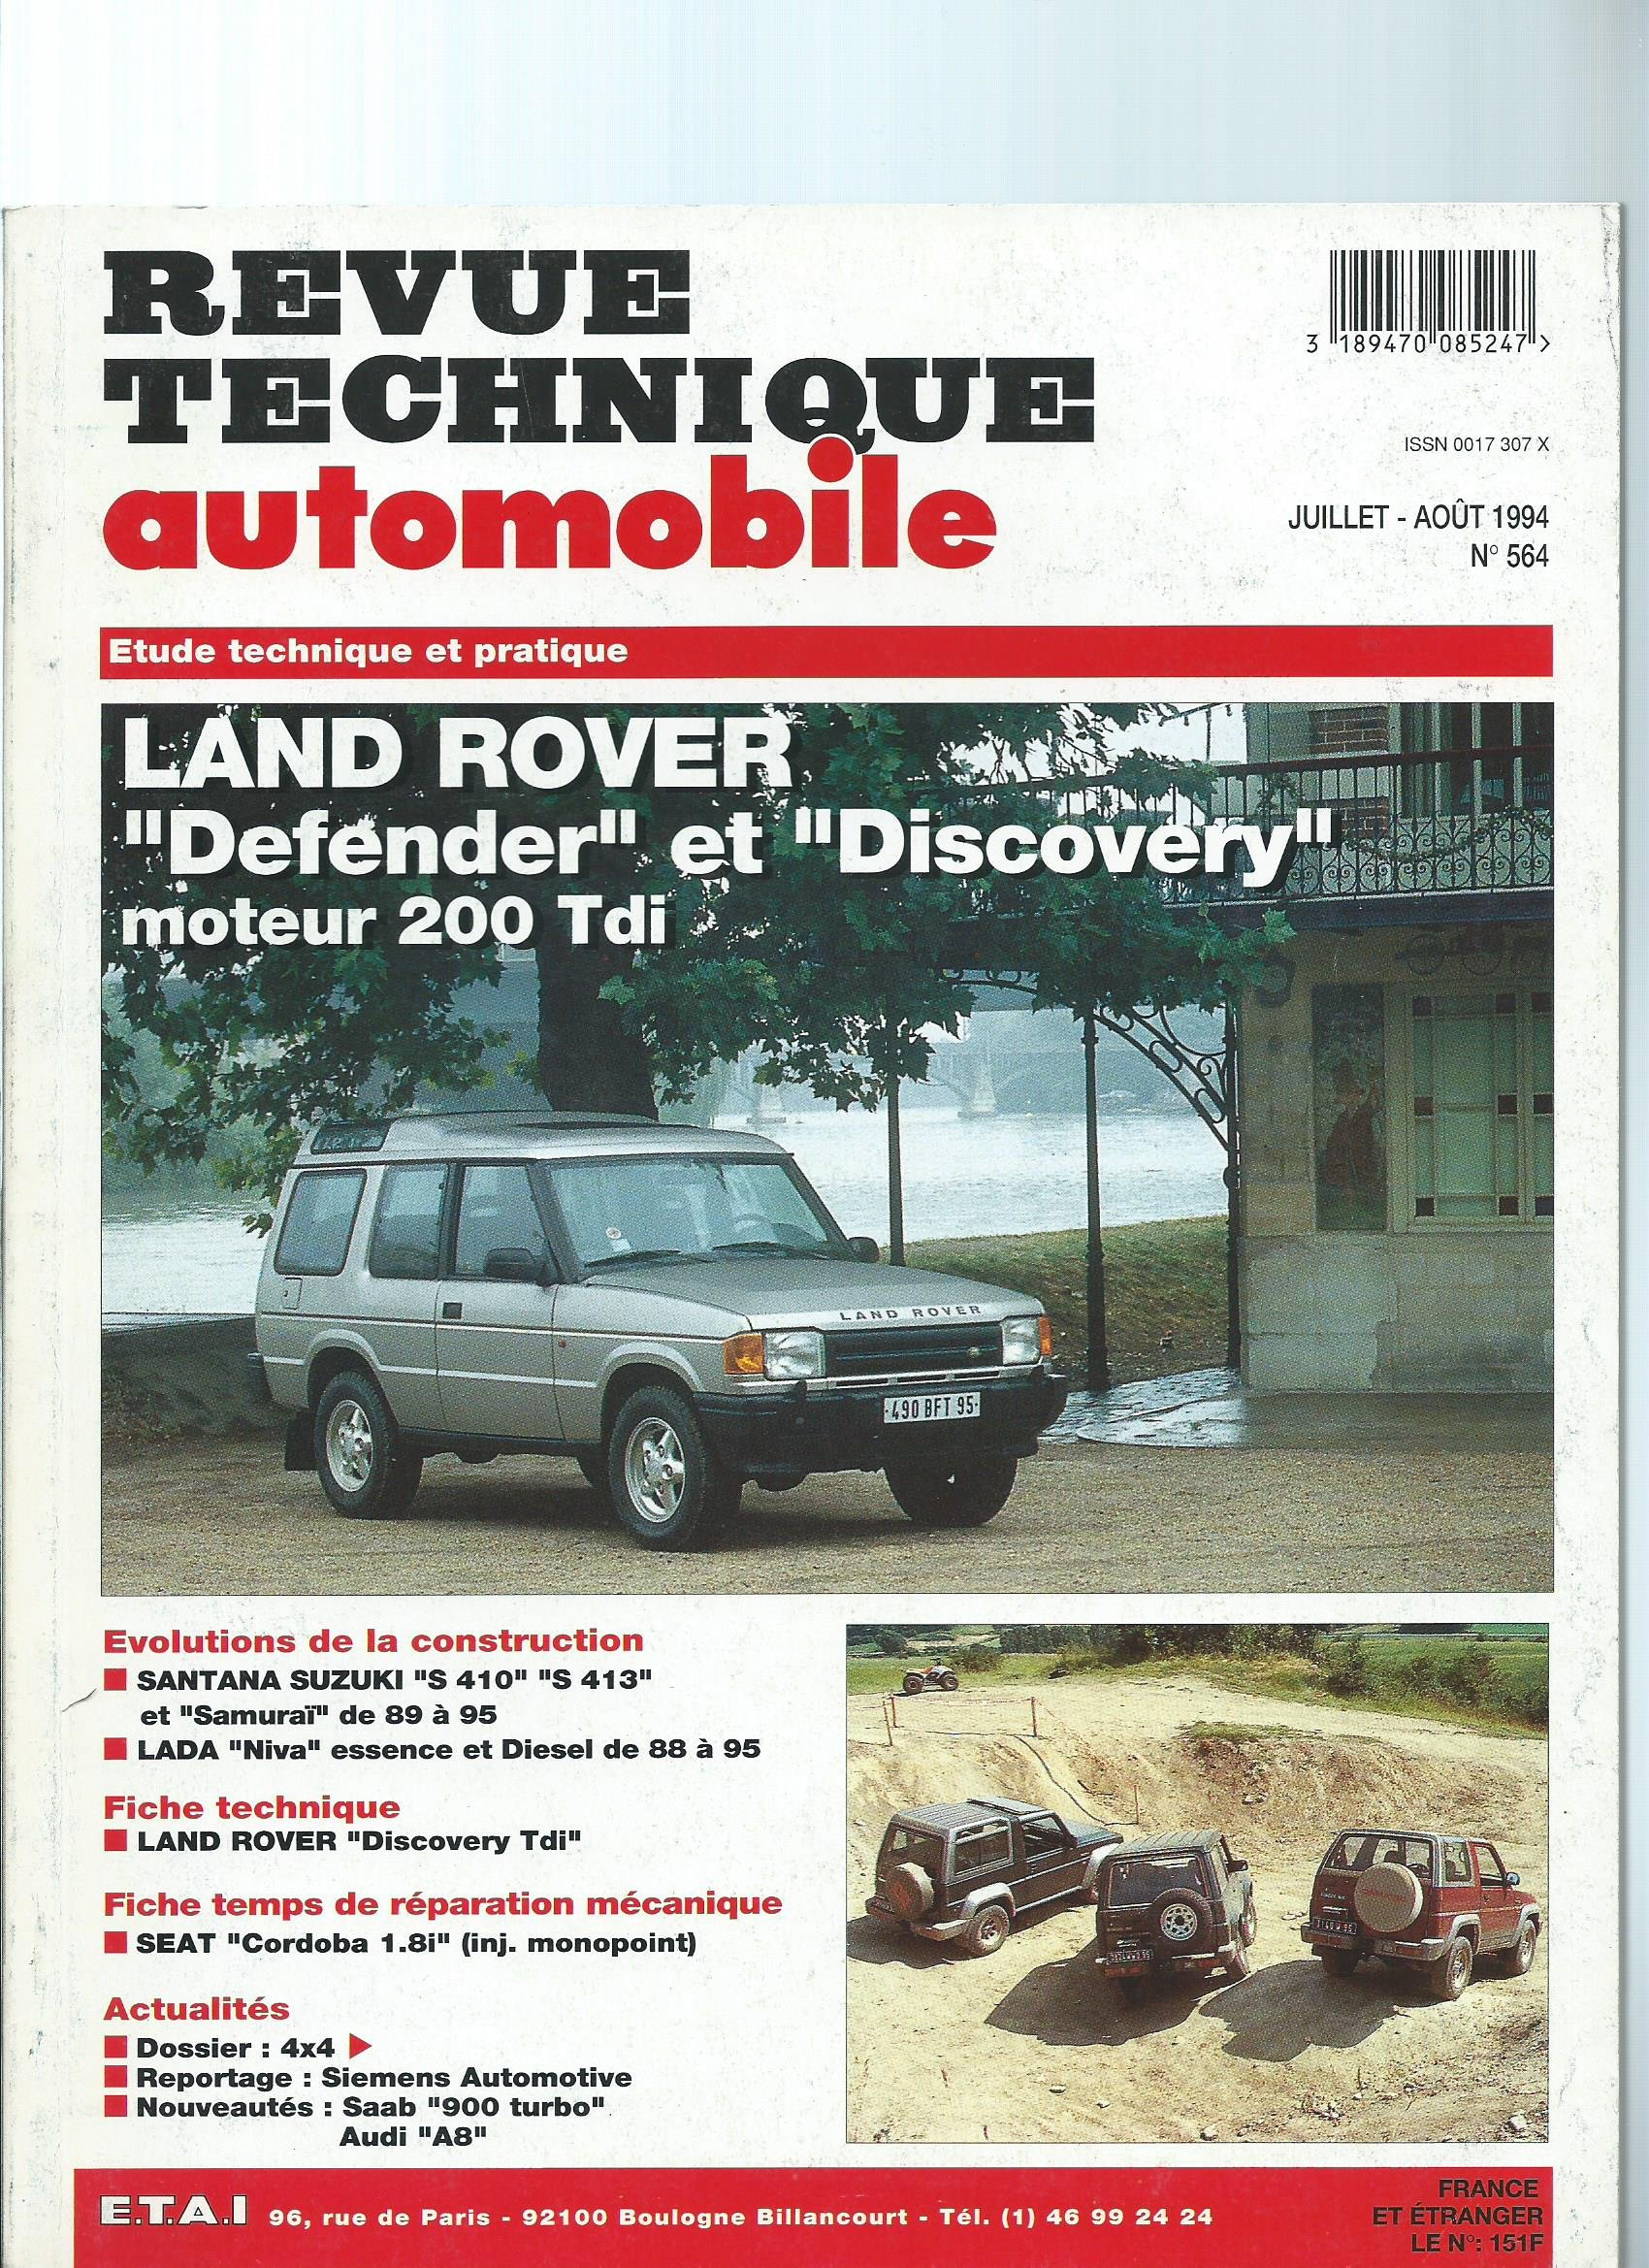 Revue technique automobile : Land rover, defender et discovery, moteur 200 tdi: Amazon.es: collectif: Libros